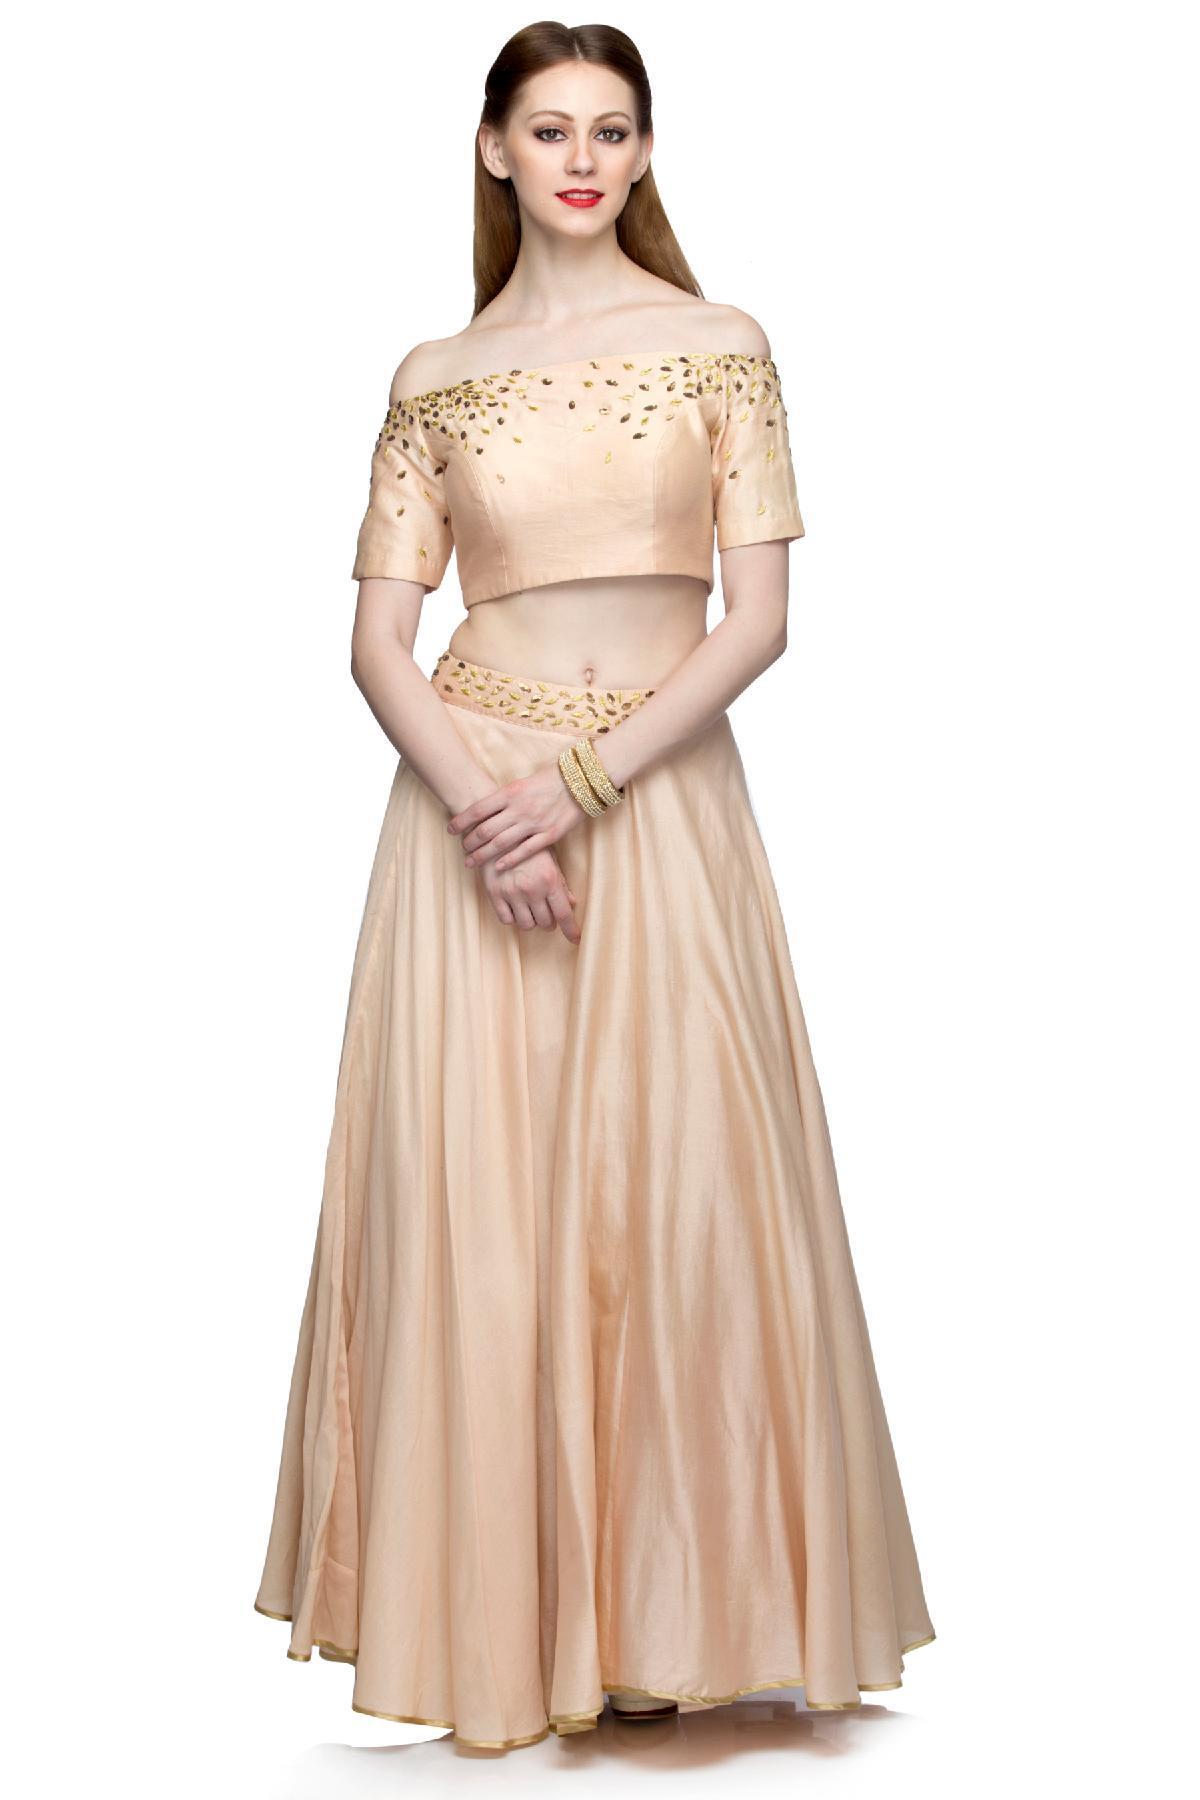 3a95b5c60c0d0 Ivory   Bronze Off Shoulder Crop Top Skirt by Salt and Spring for ...